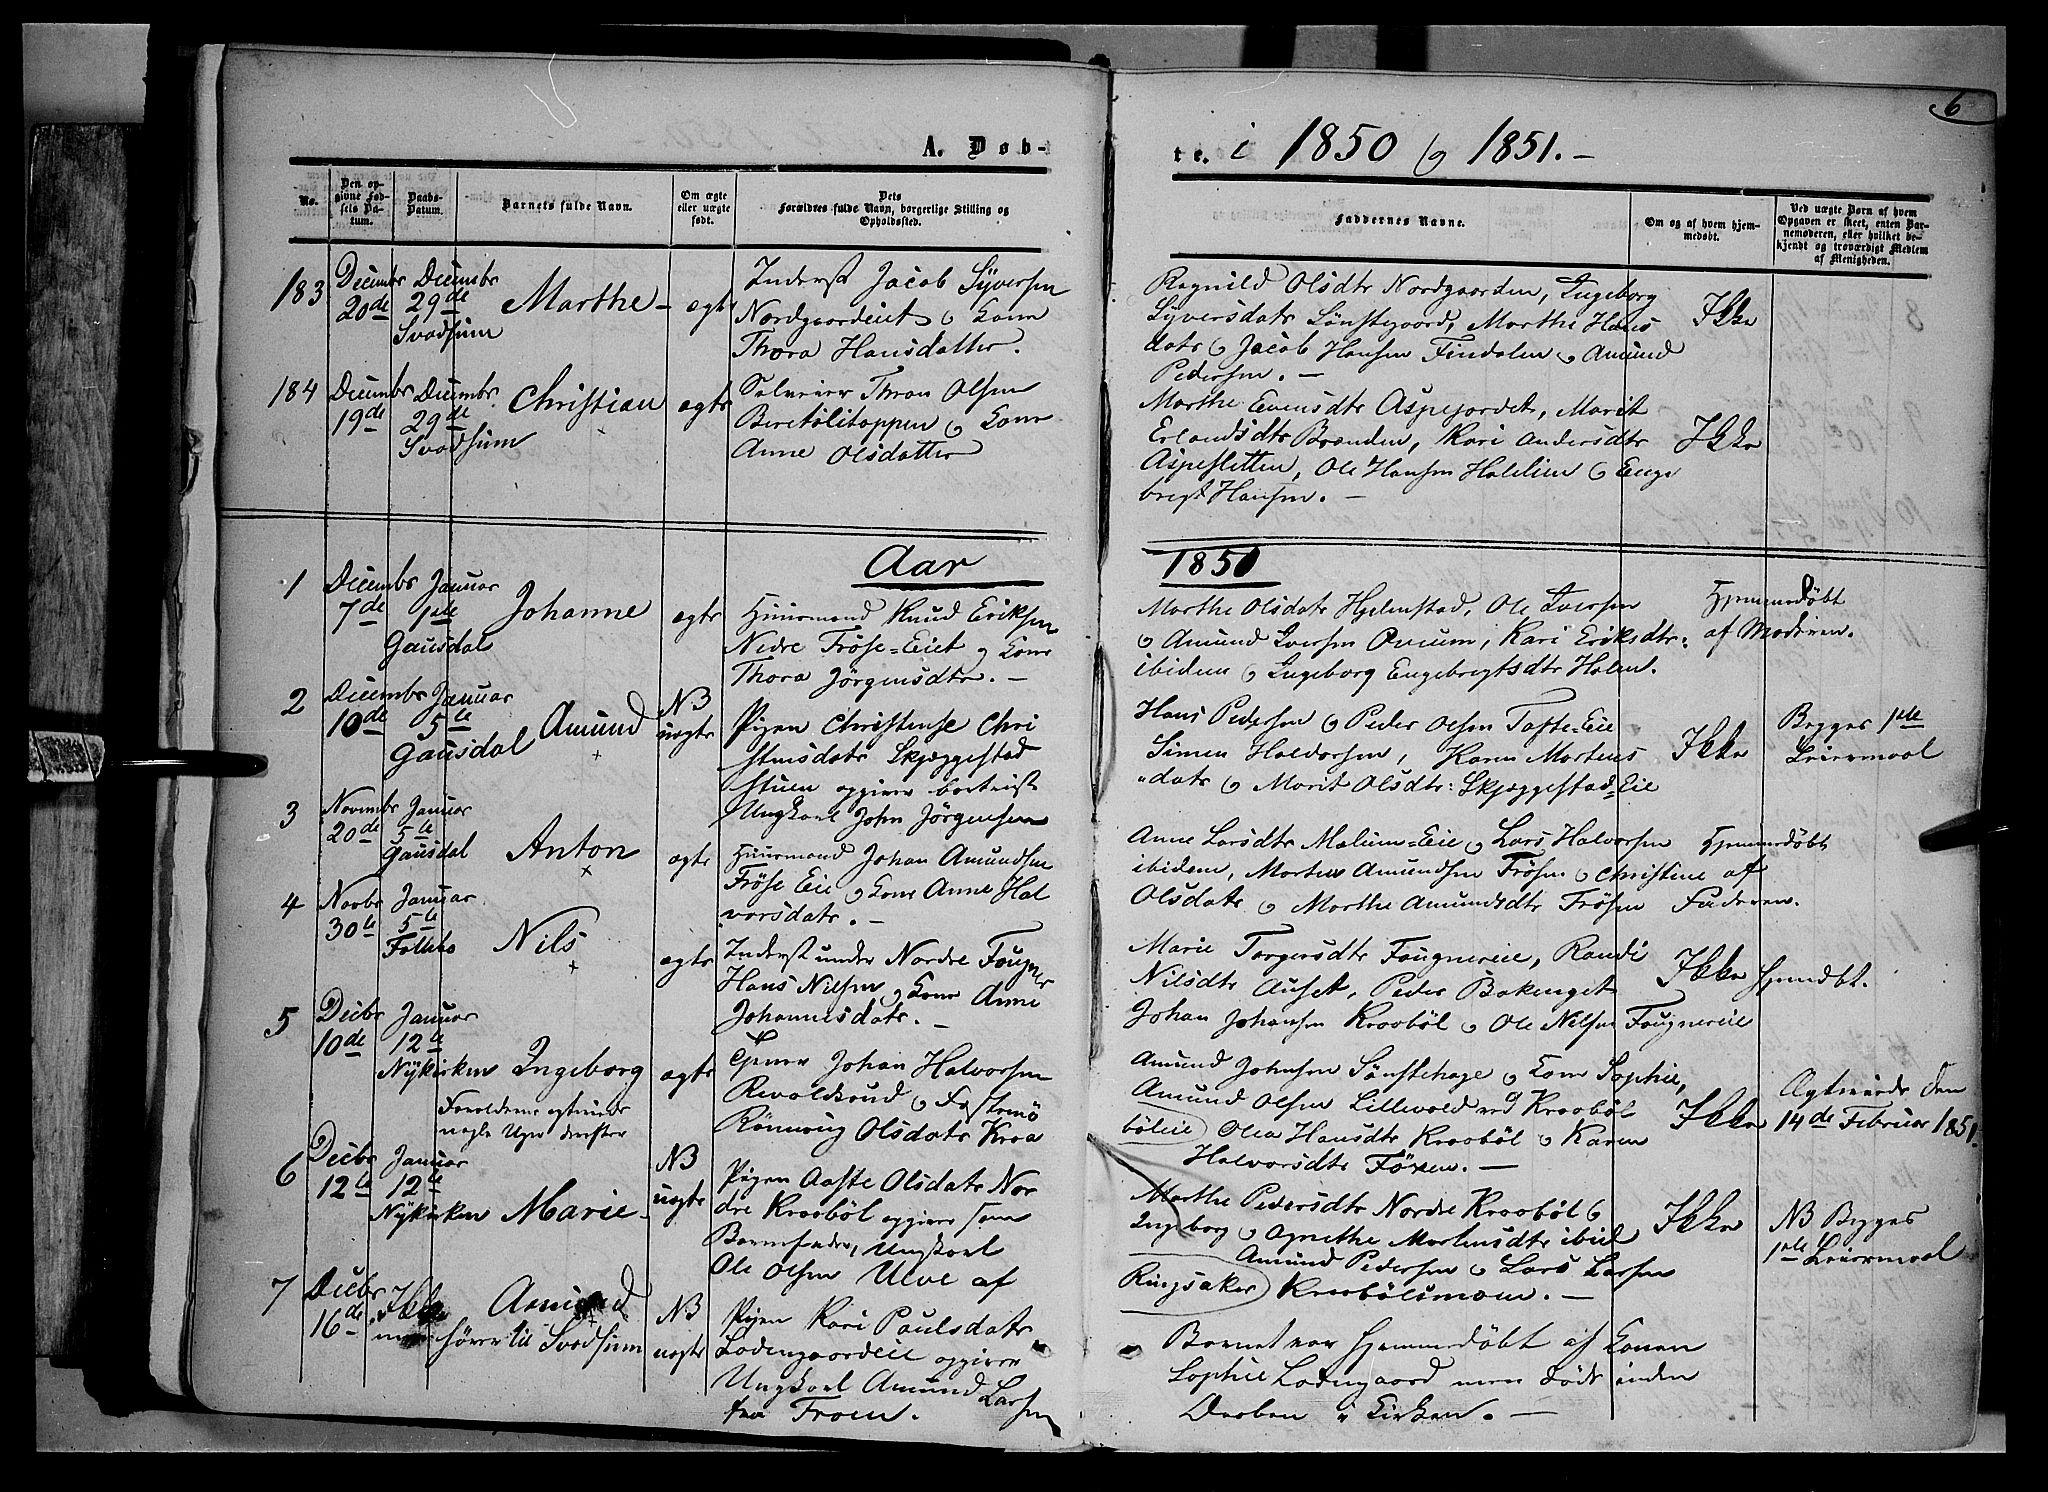 SAH, Gausdal prestekontor, Ministerialbok nr. 8, 1850-1861, s. 6